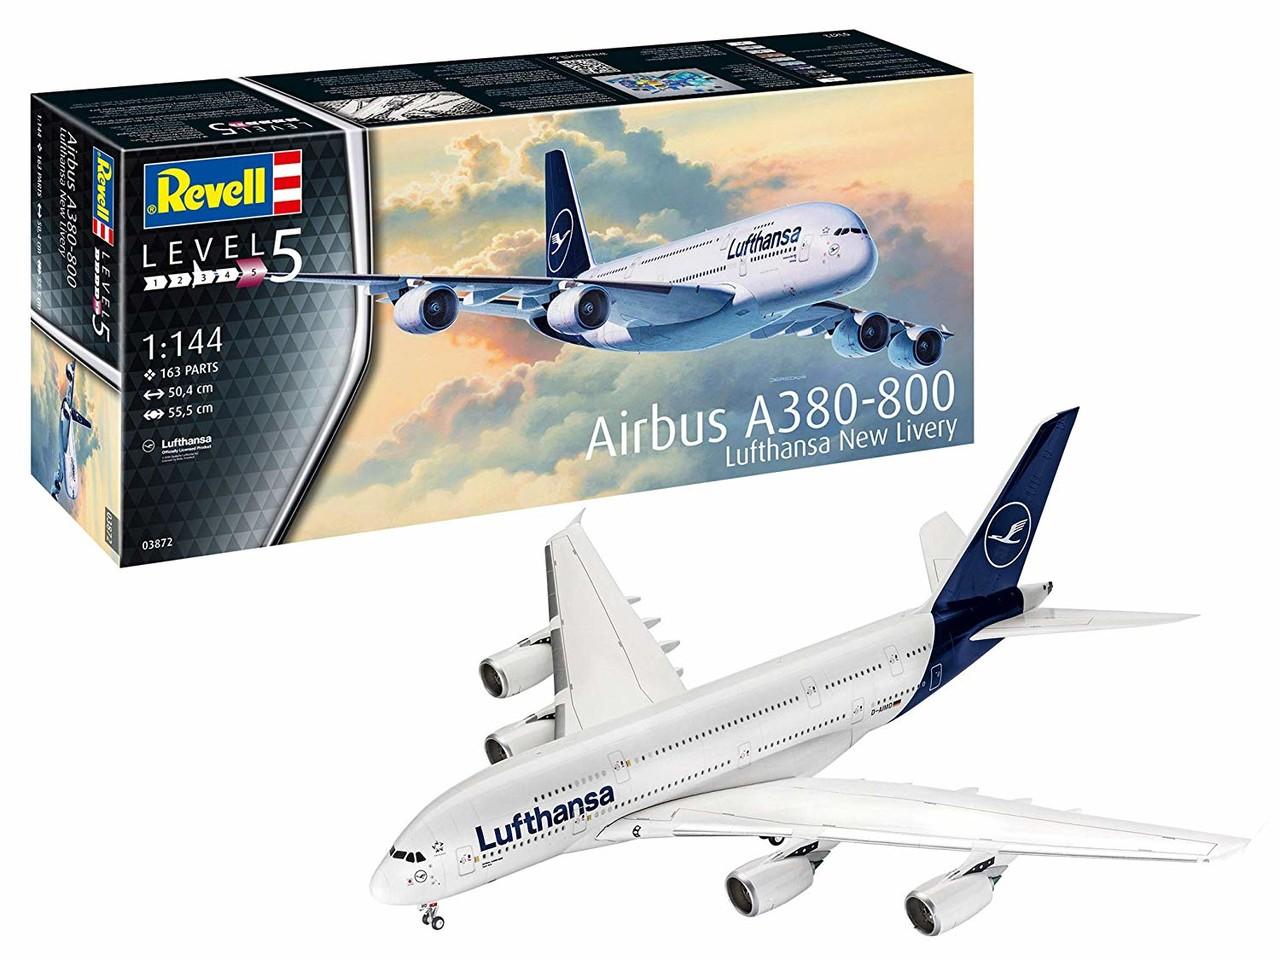 Airbus A380-800 Lufthansa New Liverya New Livery